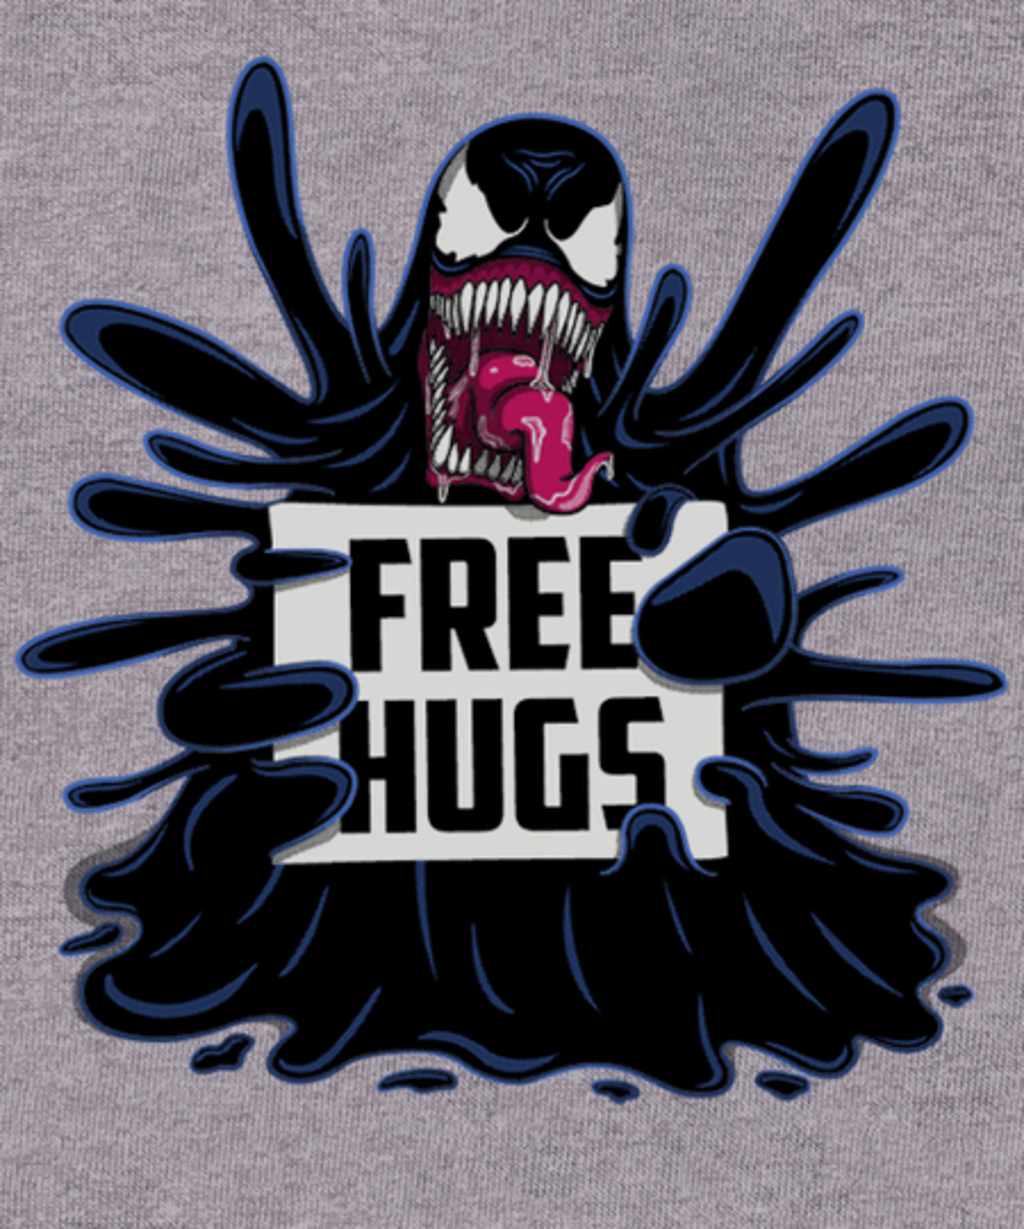 Qwertee: Symbiote Hugs!